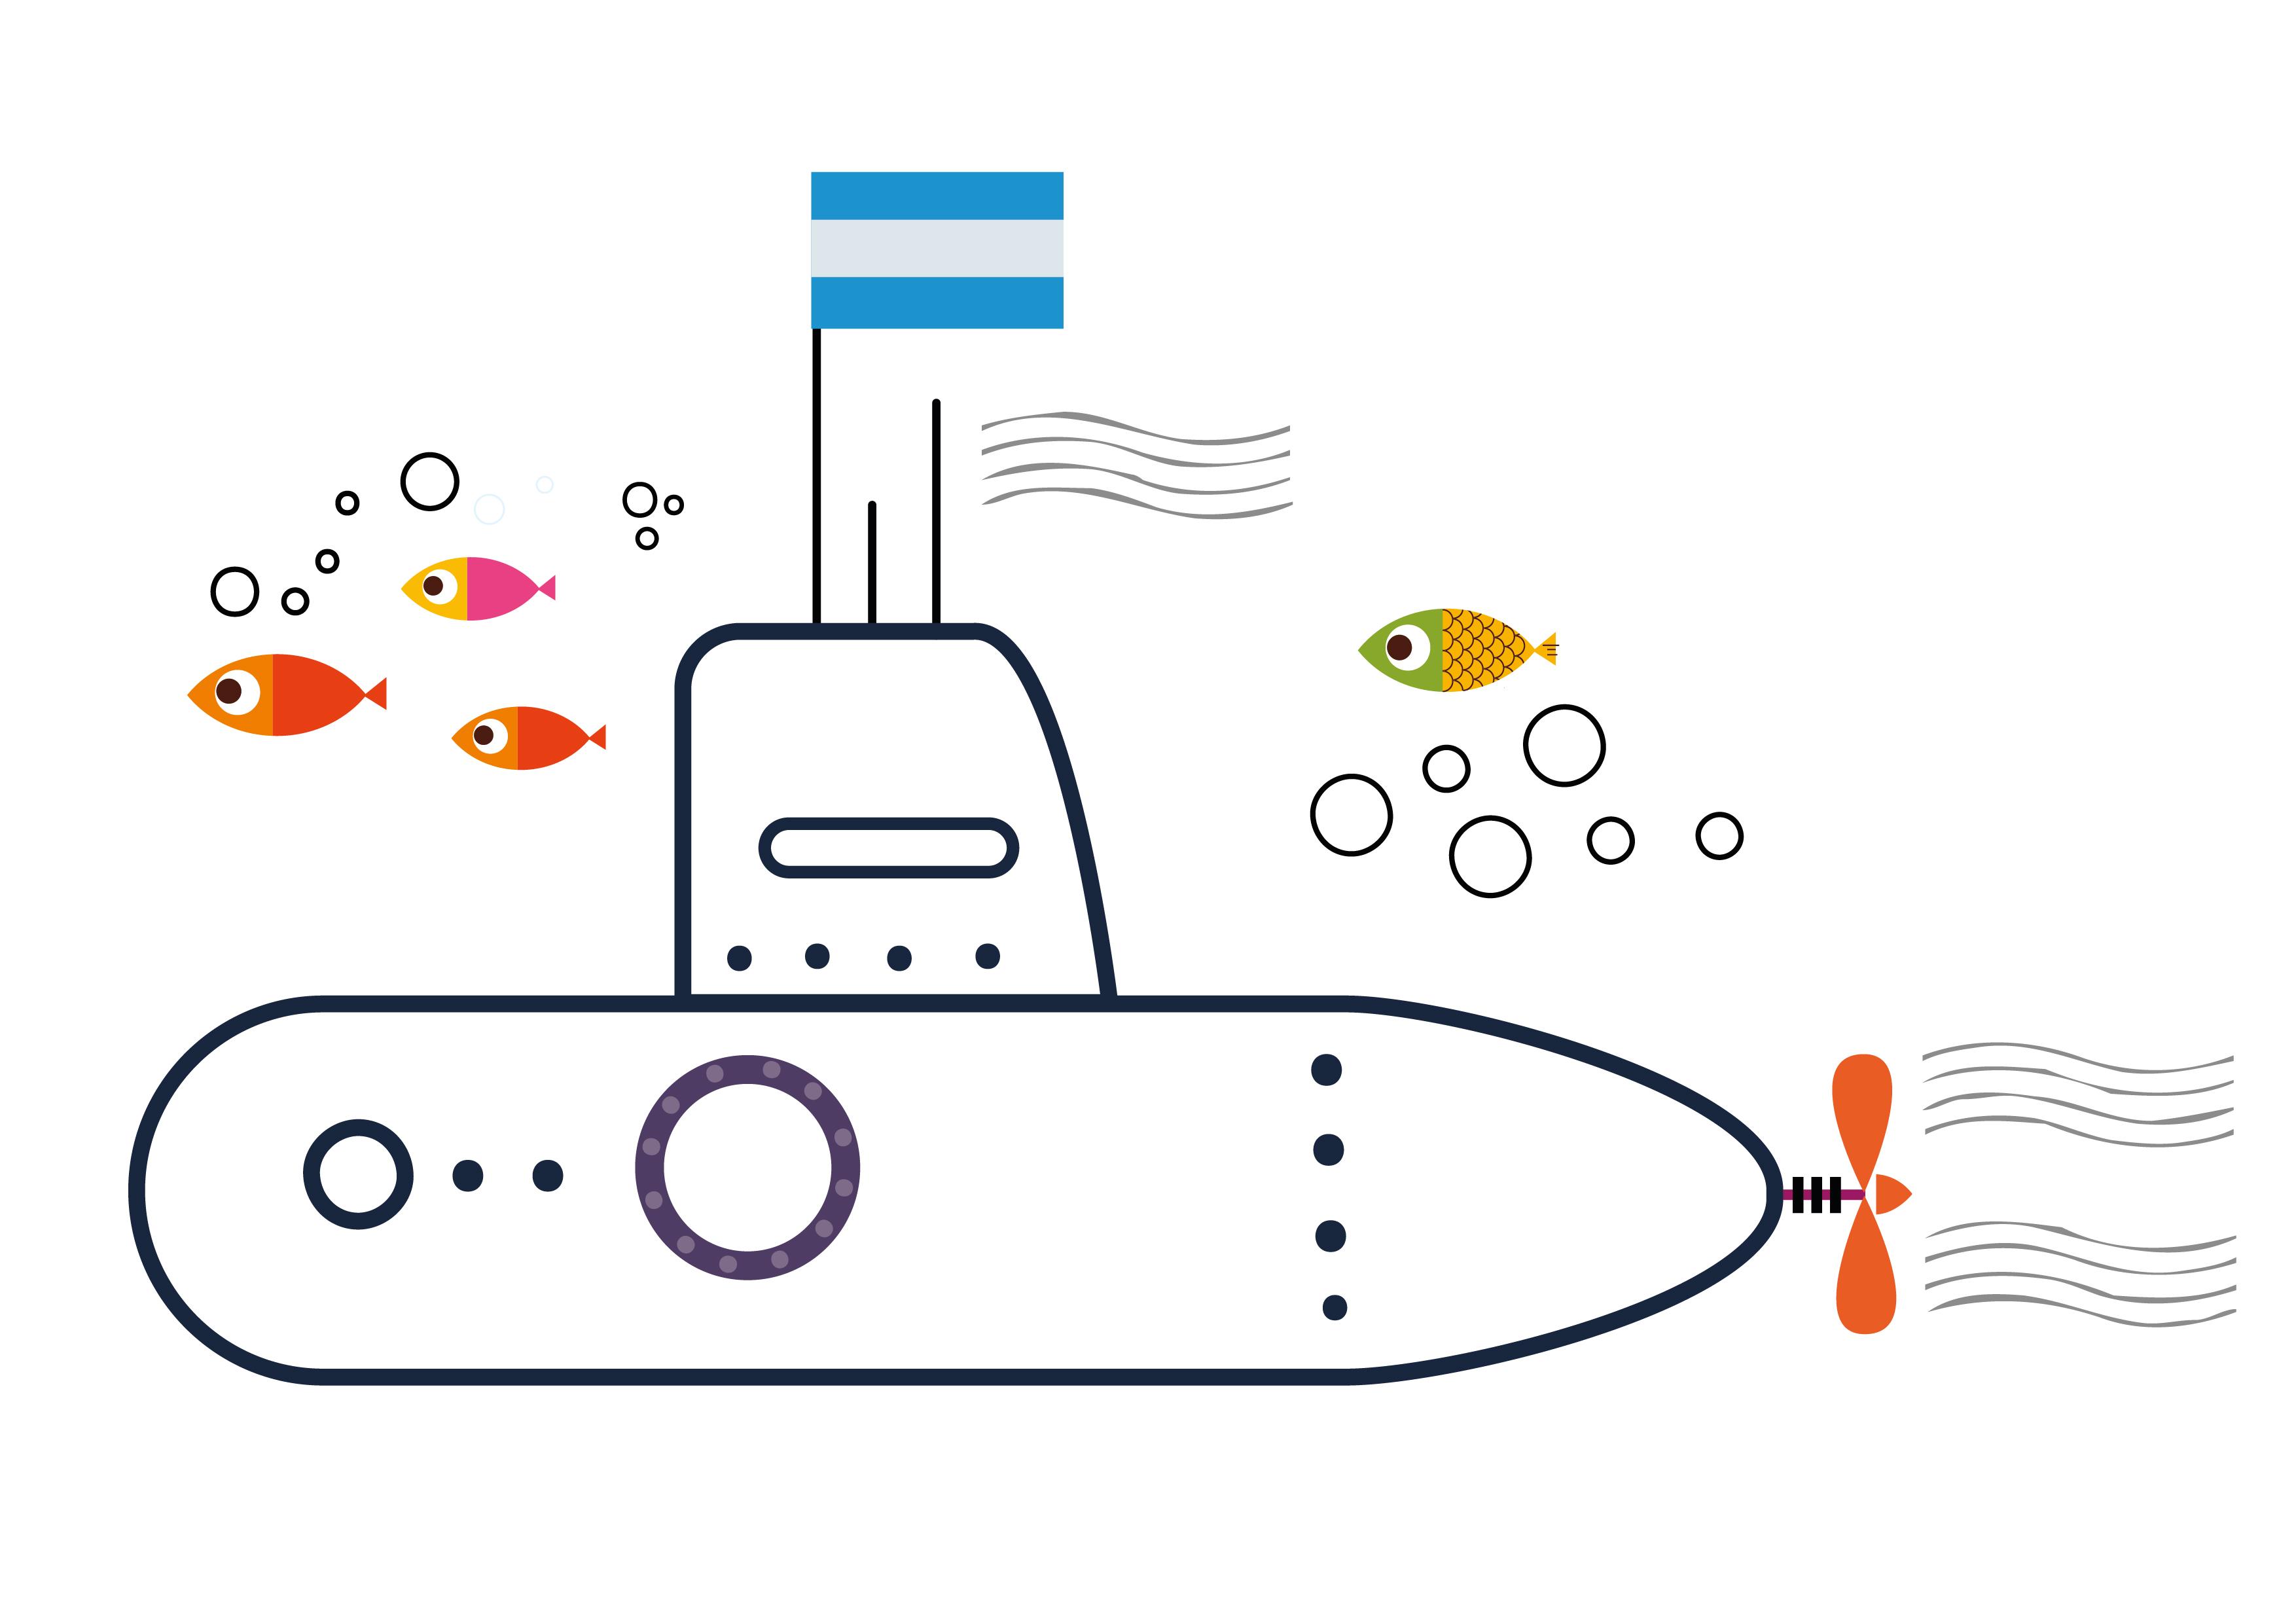 Submarino - Roberto Cubillas